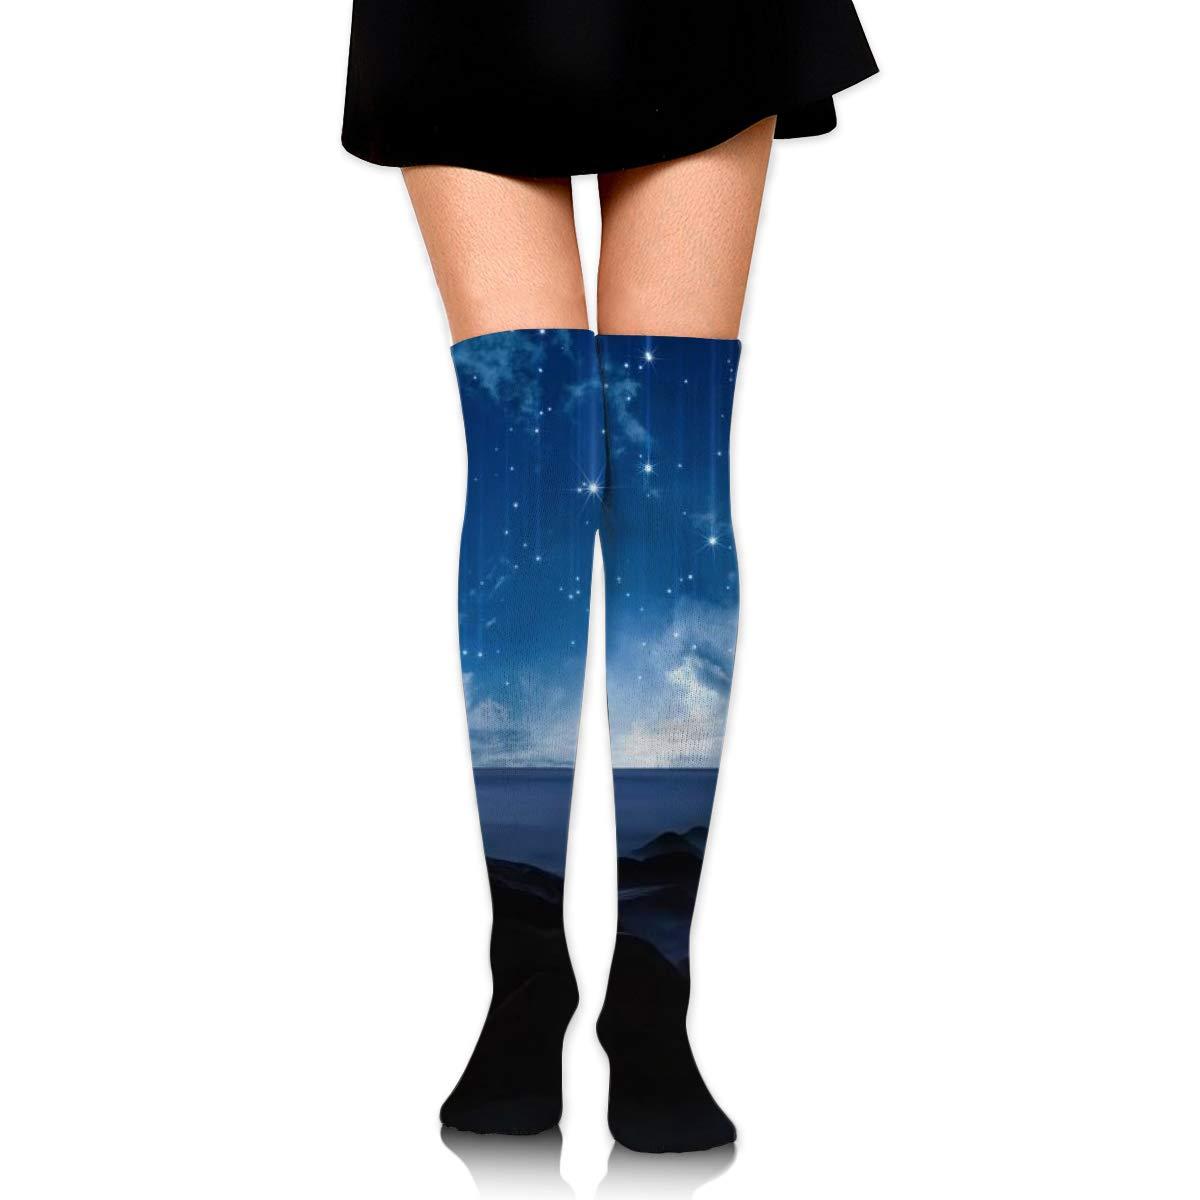 Women Crew Socks Thigh High Knee Beautiful Meniscus Long Tube Dress Legging Soccer Compression Stocking